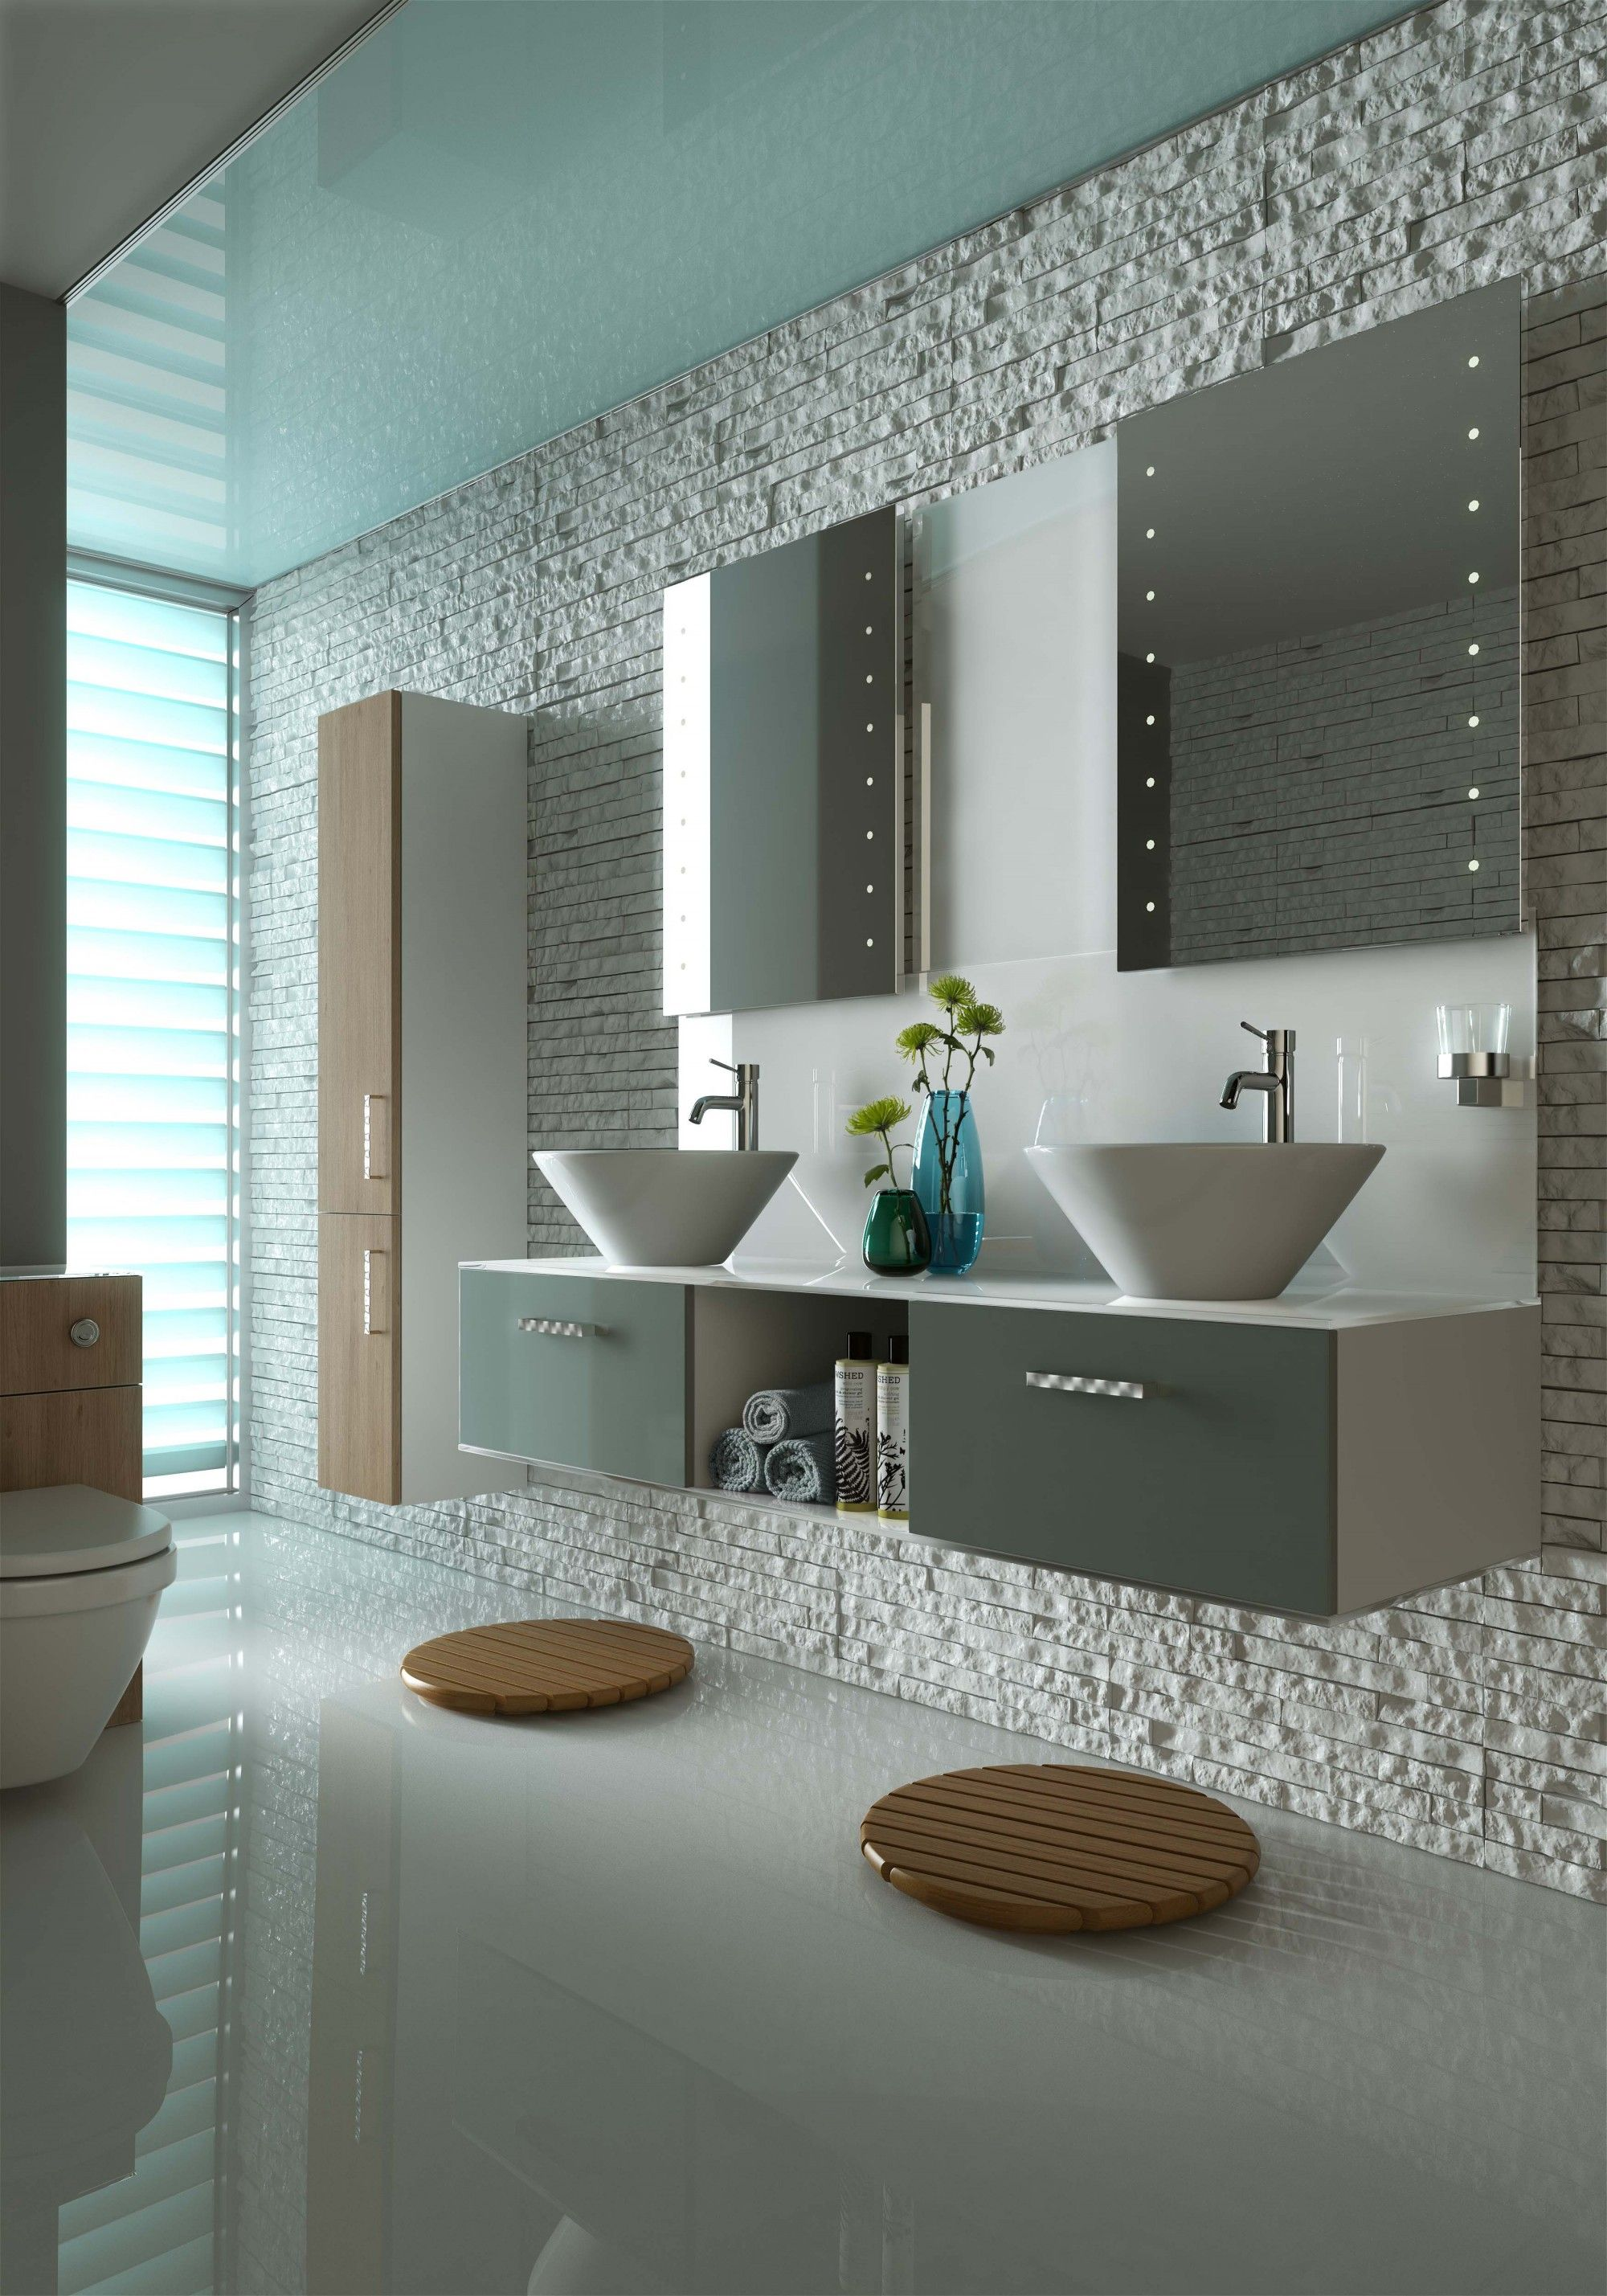 BATHROOMS BATHROOMS Bathroom Design Pinterest